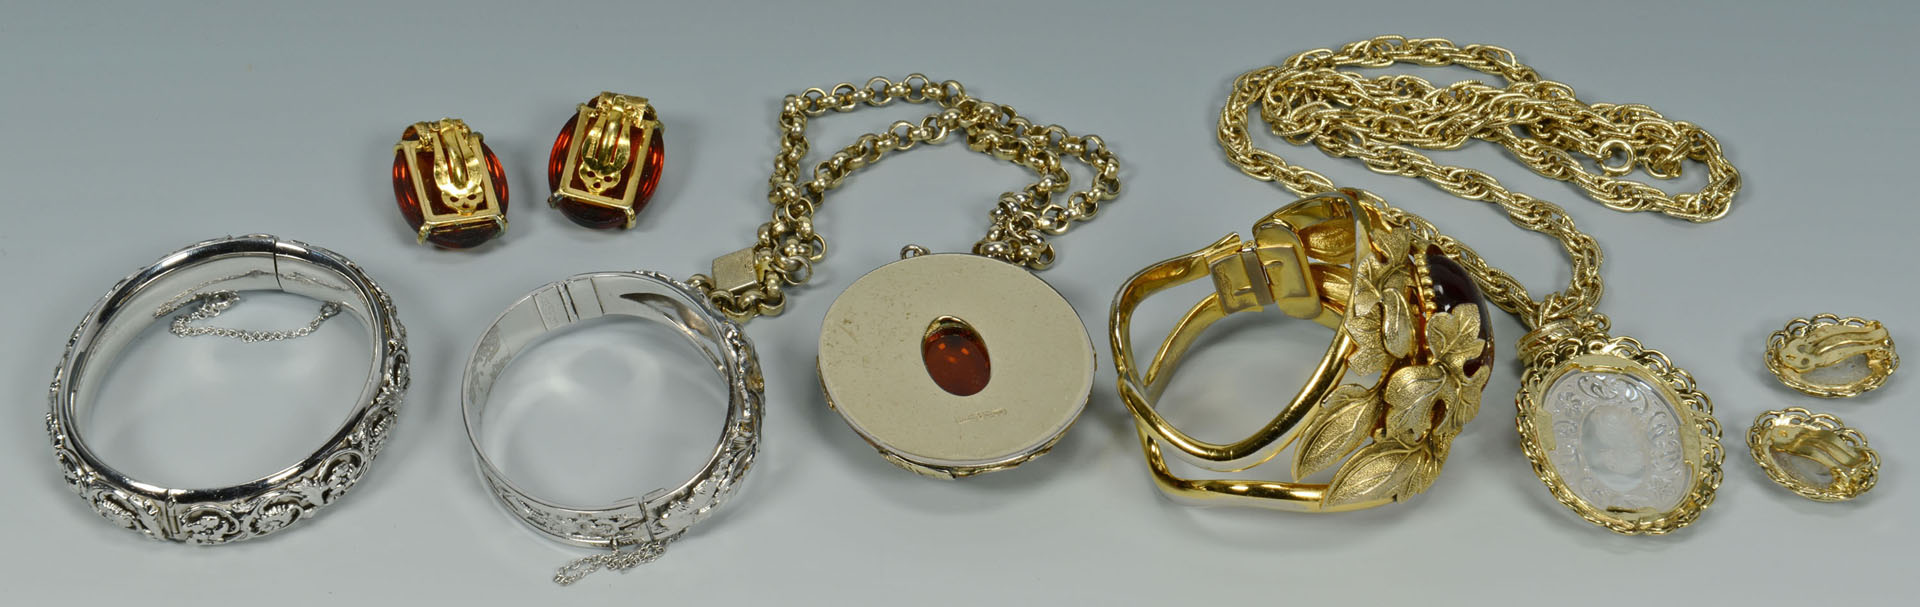 Whiting & Davis Costume Jewelry, 7 pcs